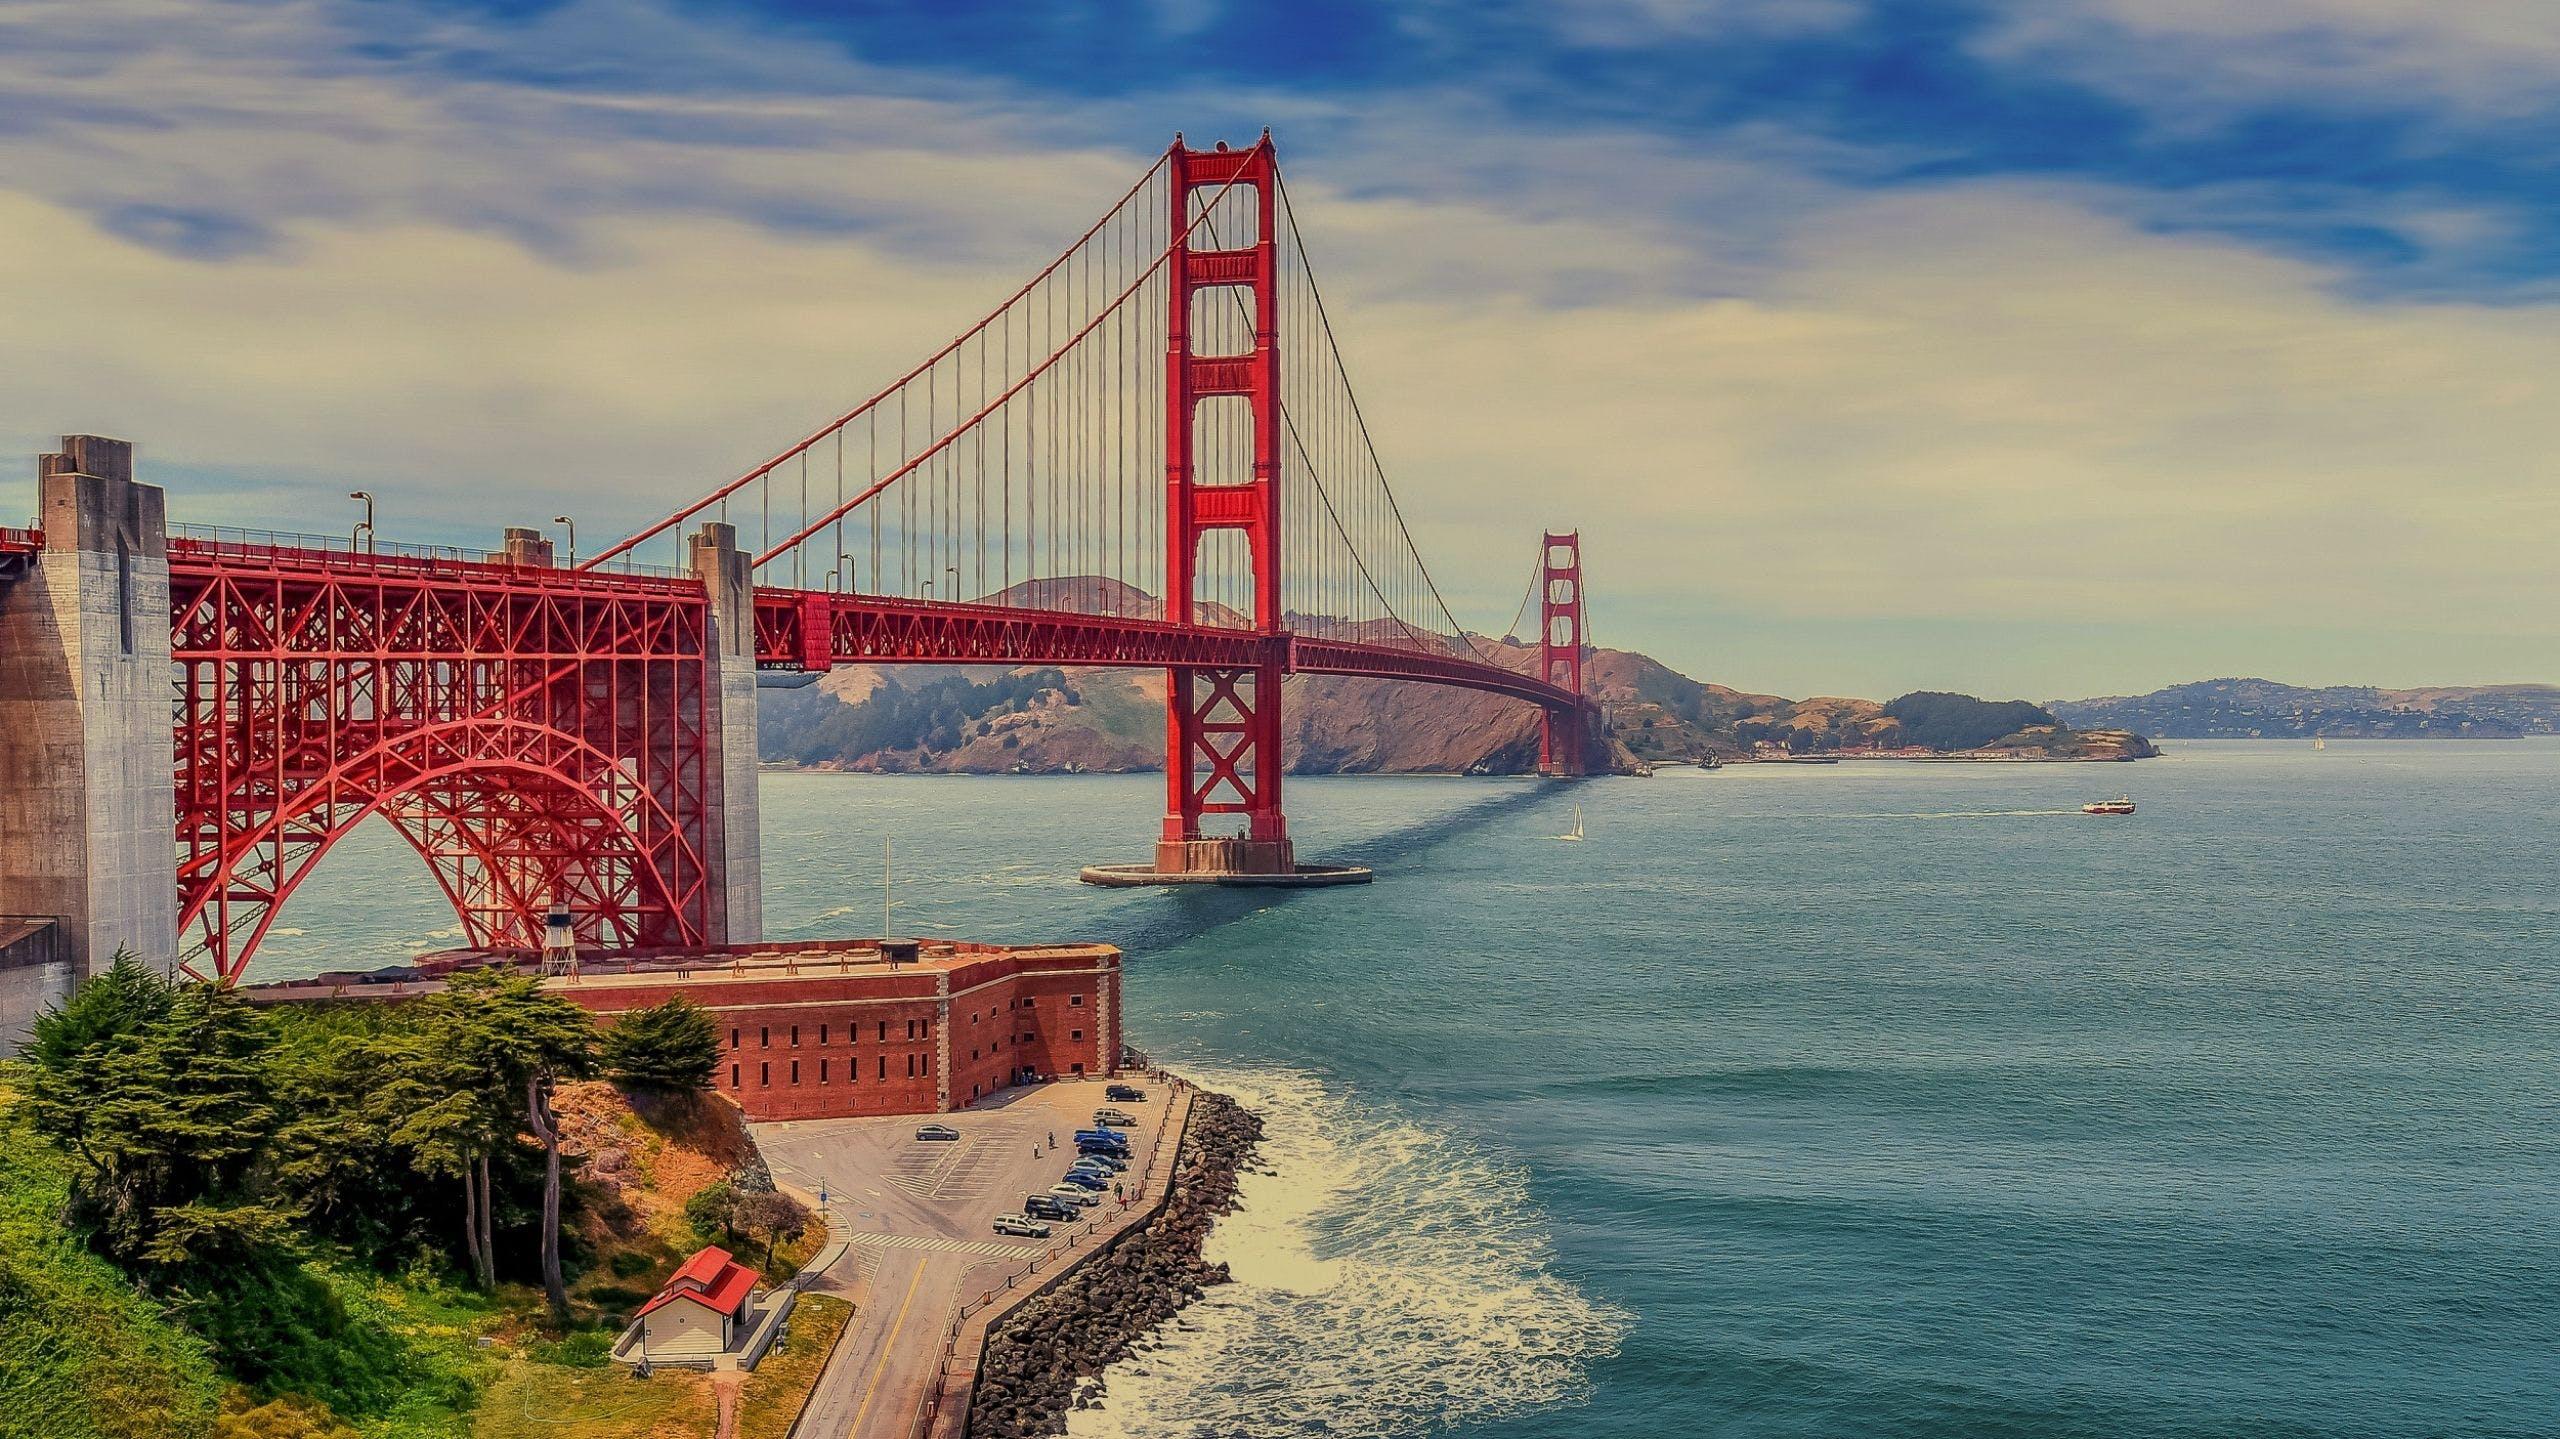 San Francisco Golden Gate Bridge Wallpaper Posted By Christopher Thompson